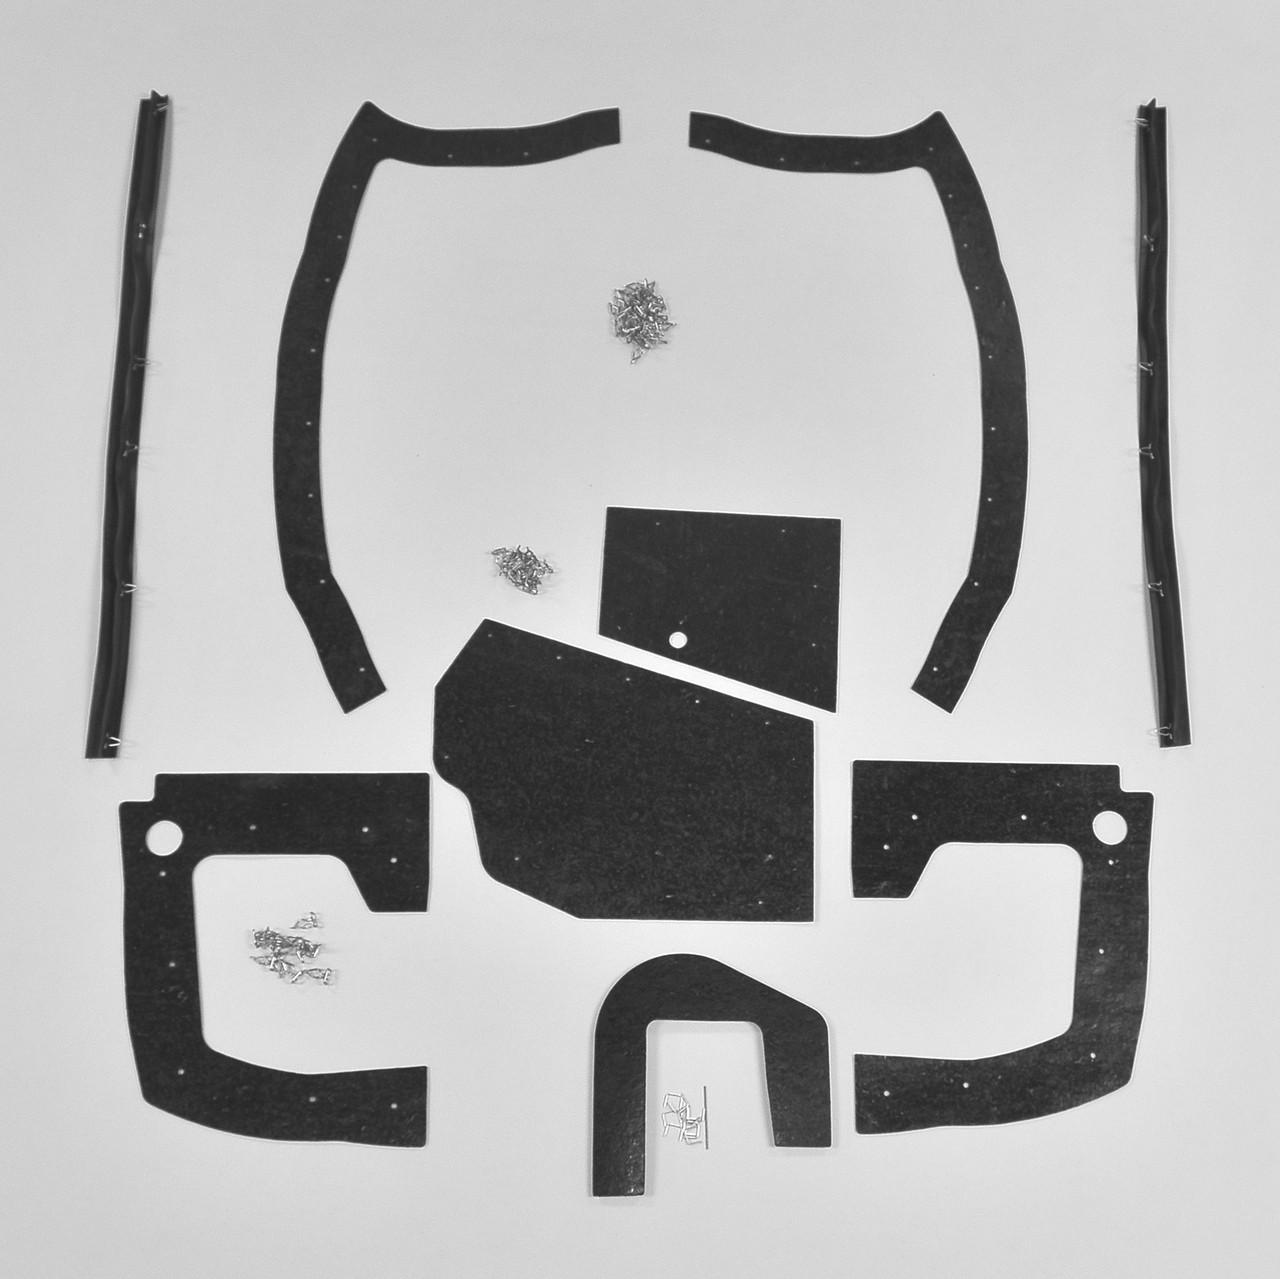 mopar b body 70 coronet super bee mega splash shield set auto detroit muscle technologies llc [ 1280 x 1279 Pixel ]